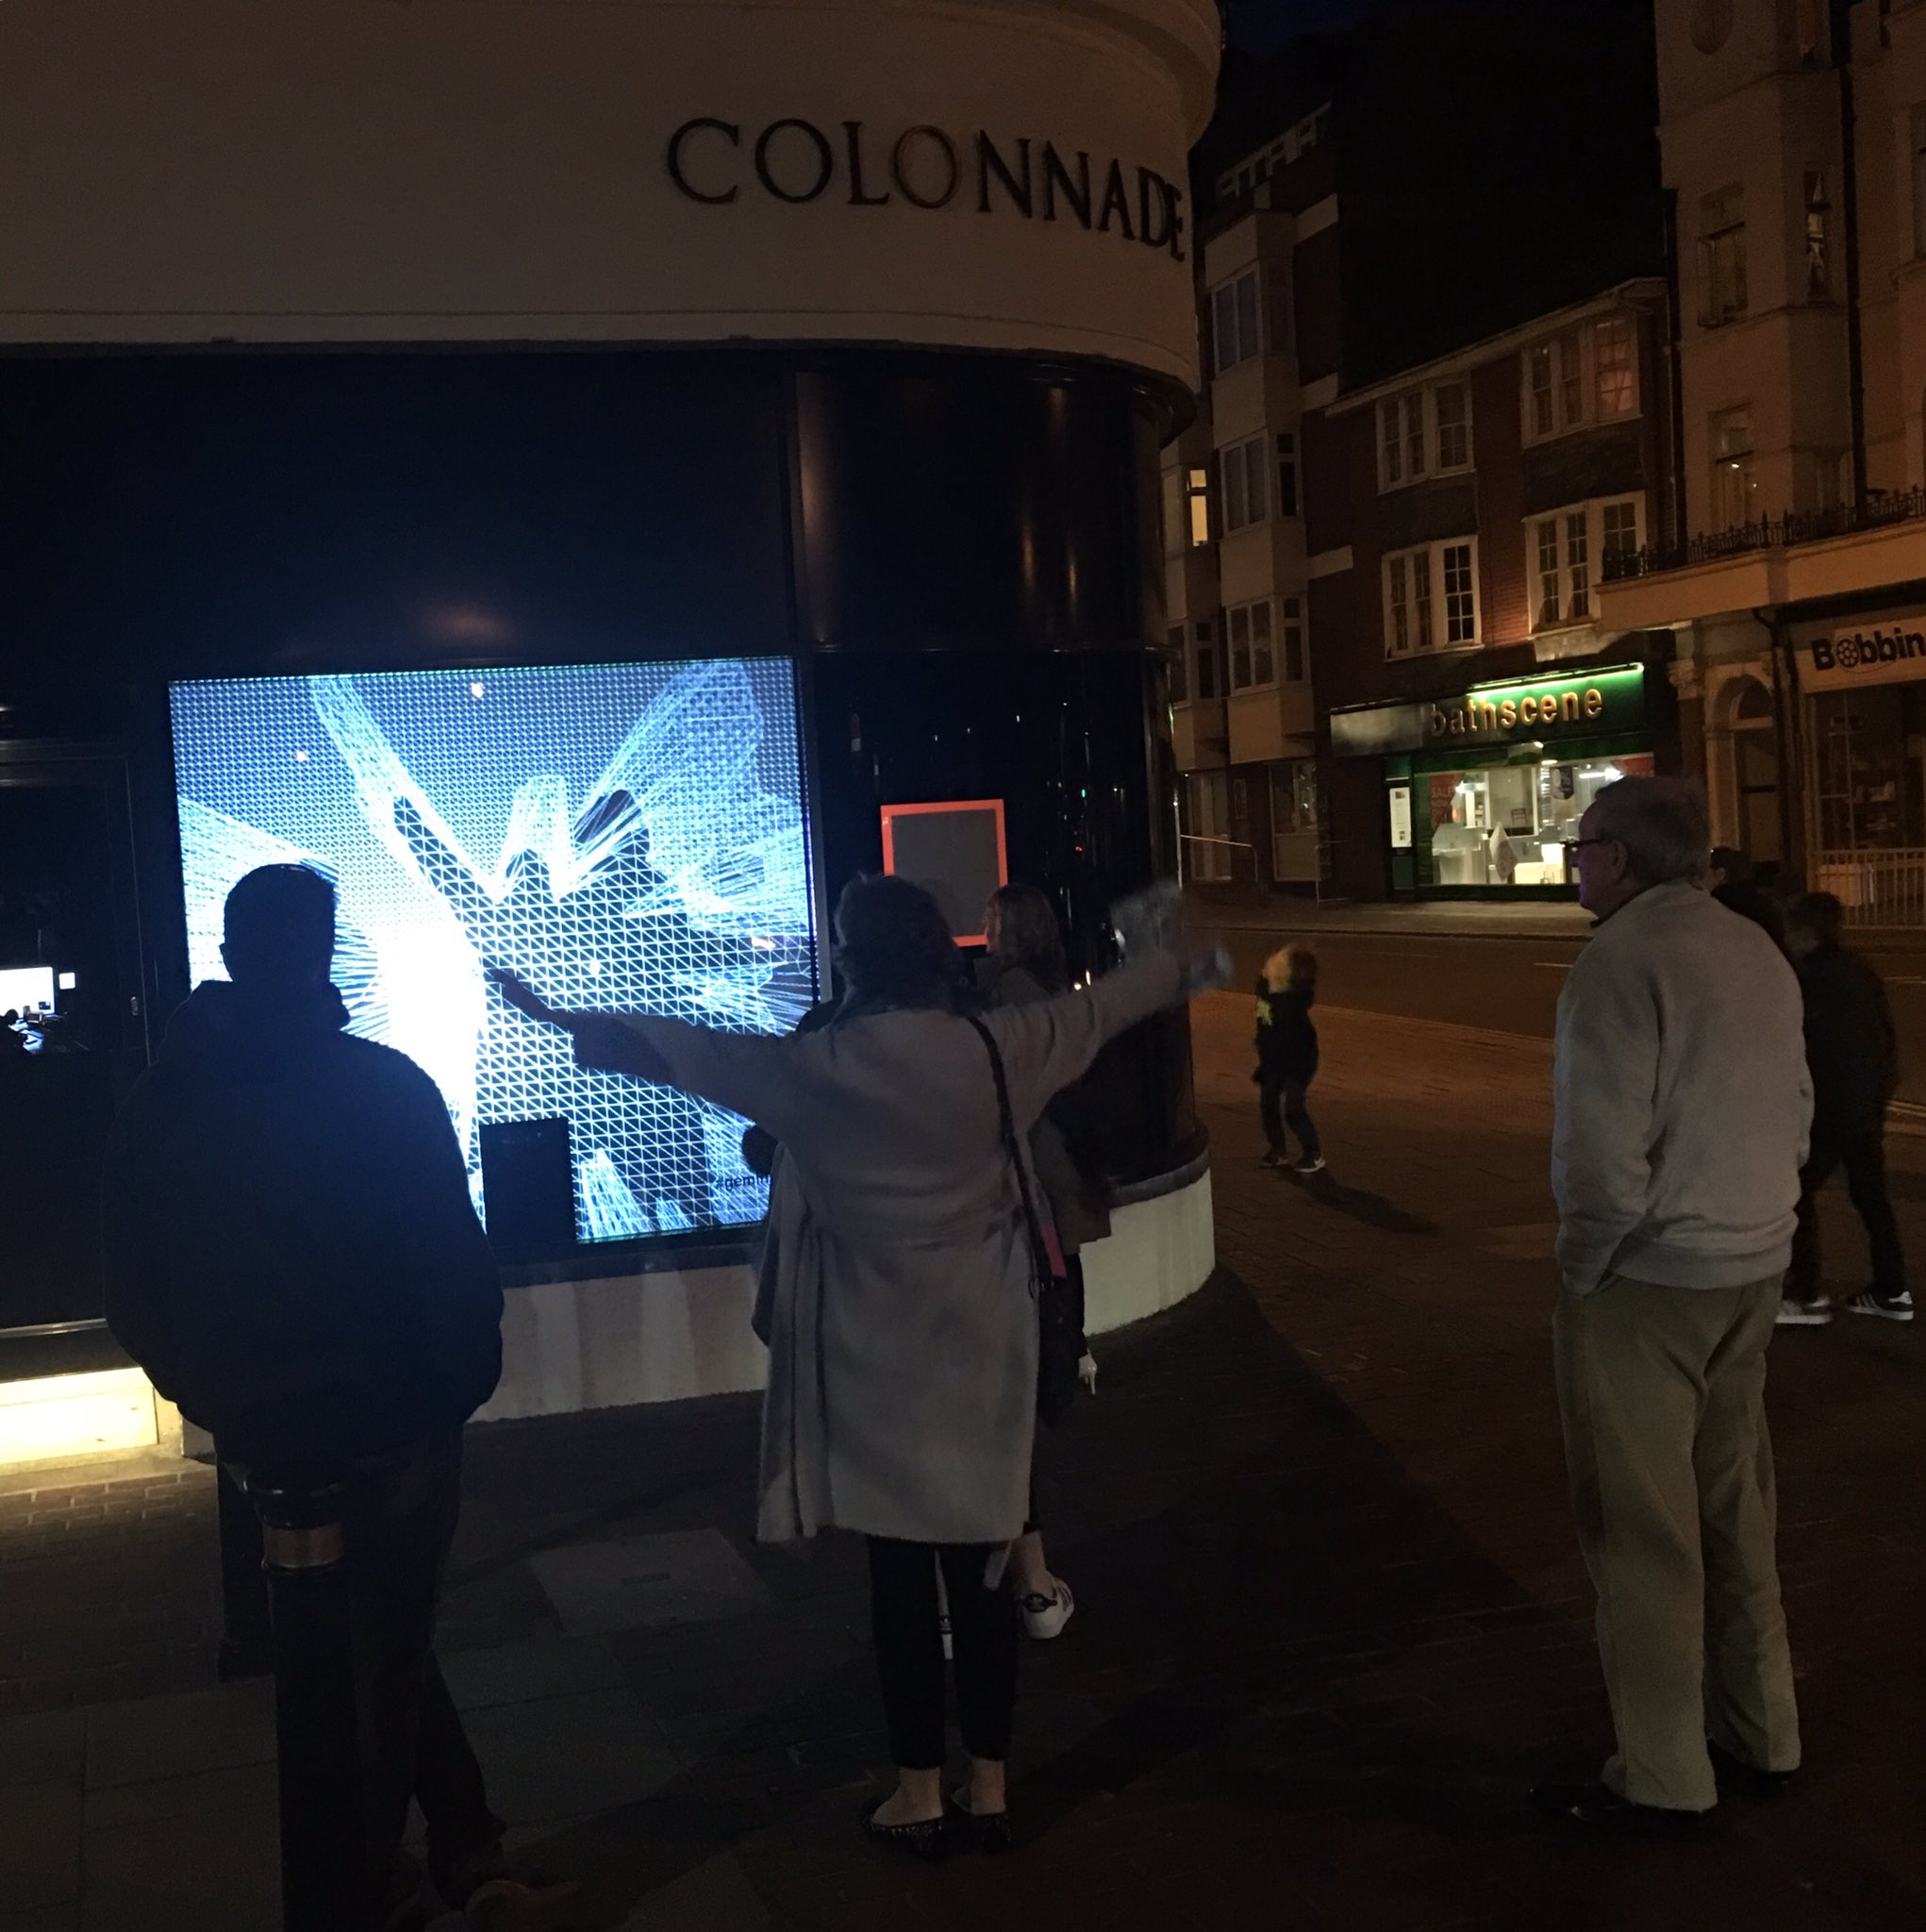 Fri & sat 7-10pm join choreographer Jen Irons to explore playfulness & creative interaction #geminate #publicart @ColonnadeHse @makeAMPLIFY https://t.co/ISO0eruxA3